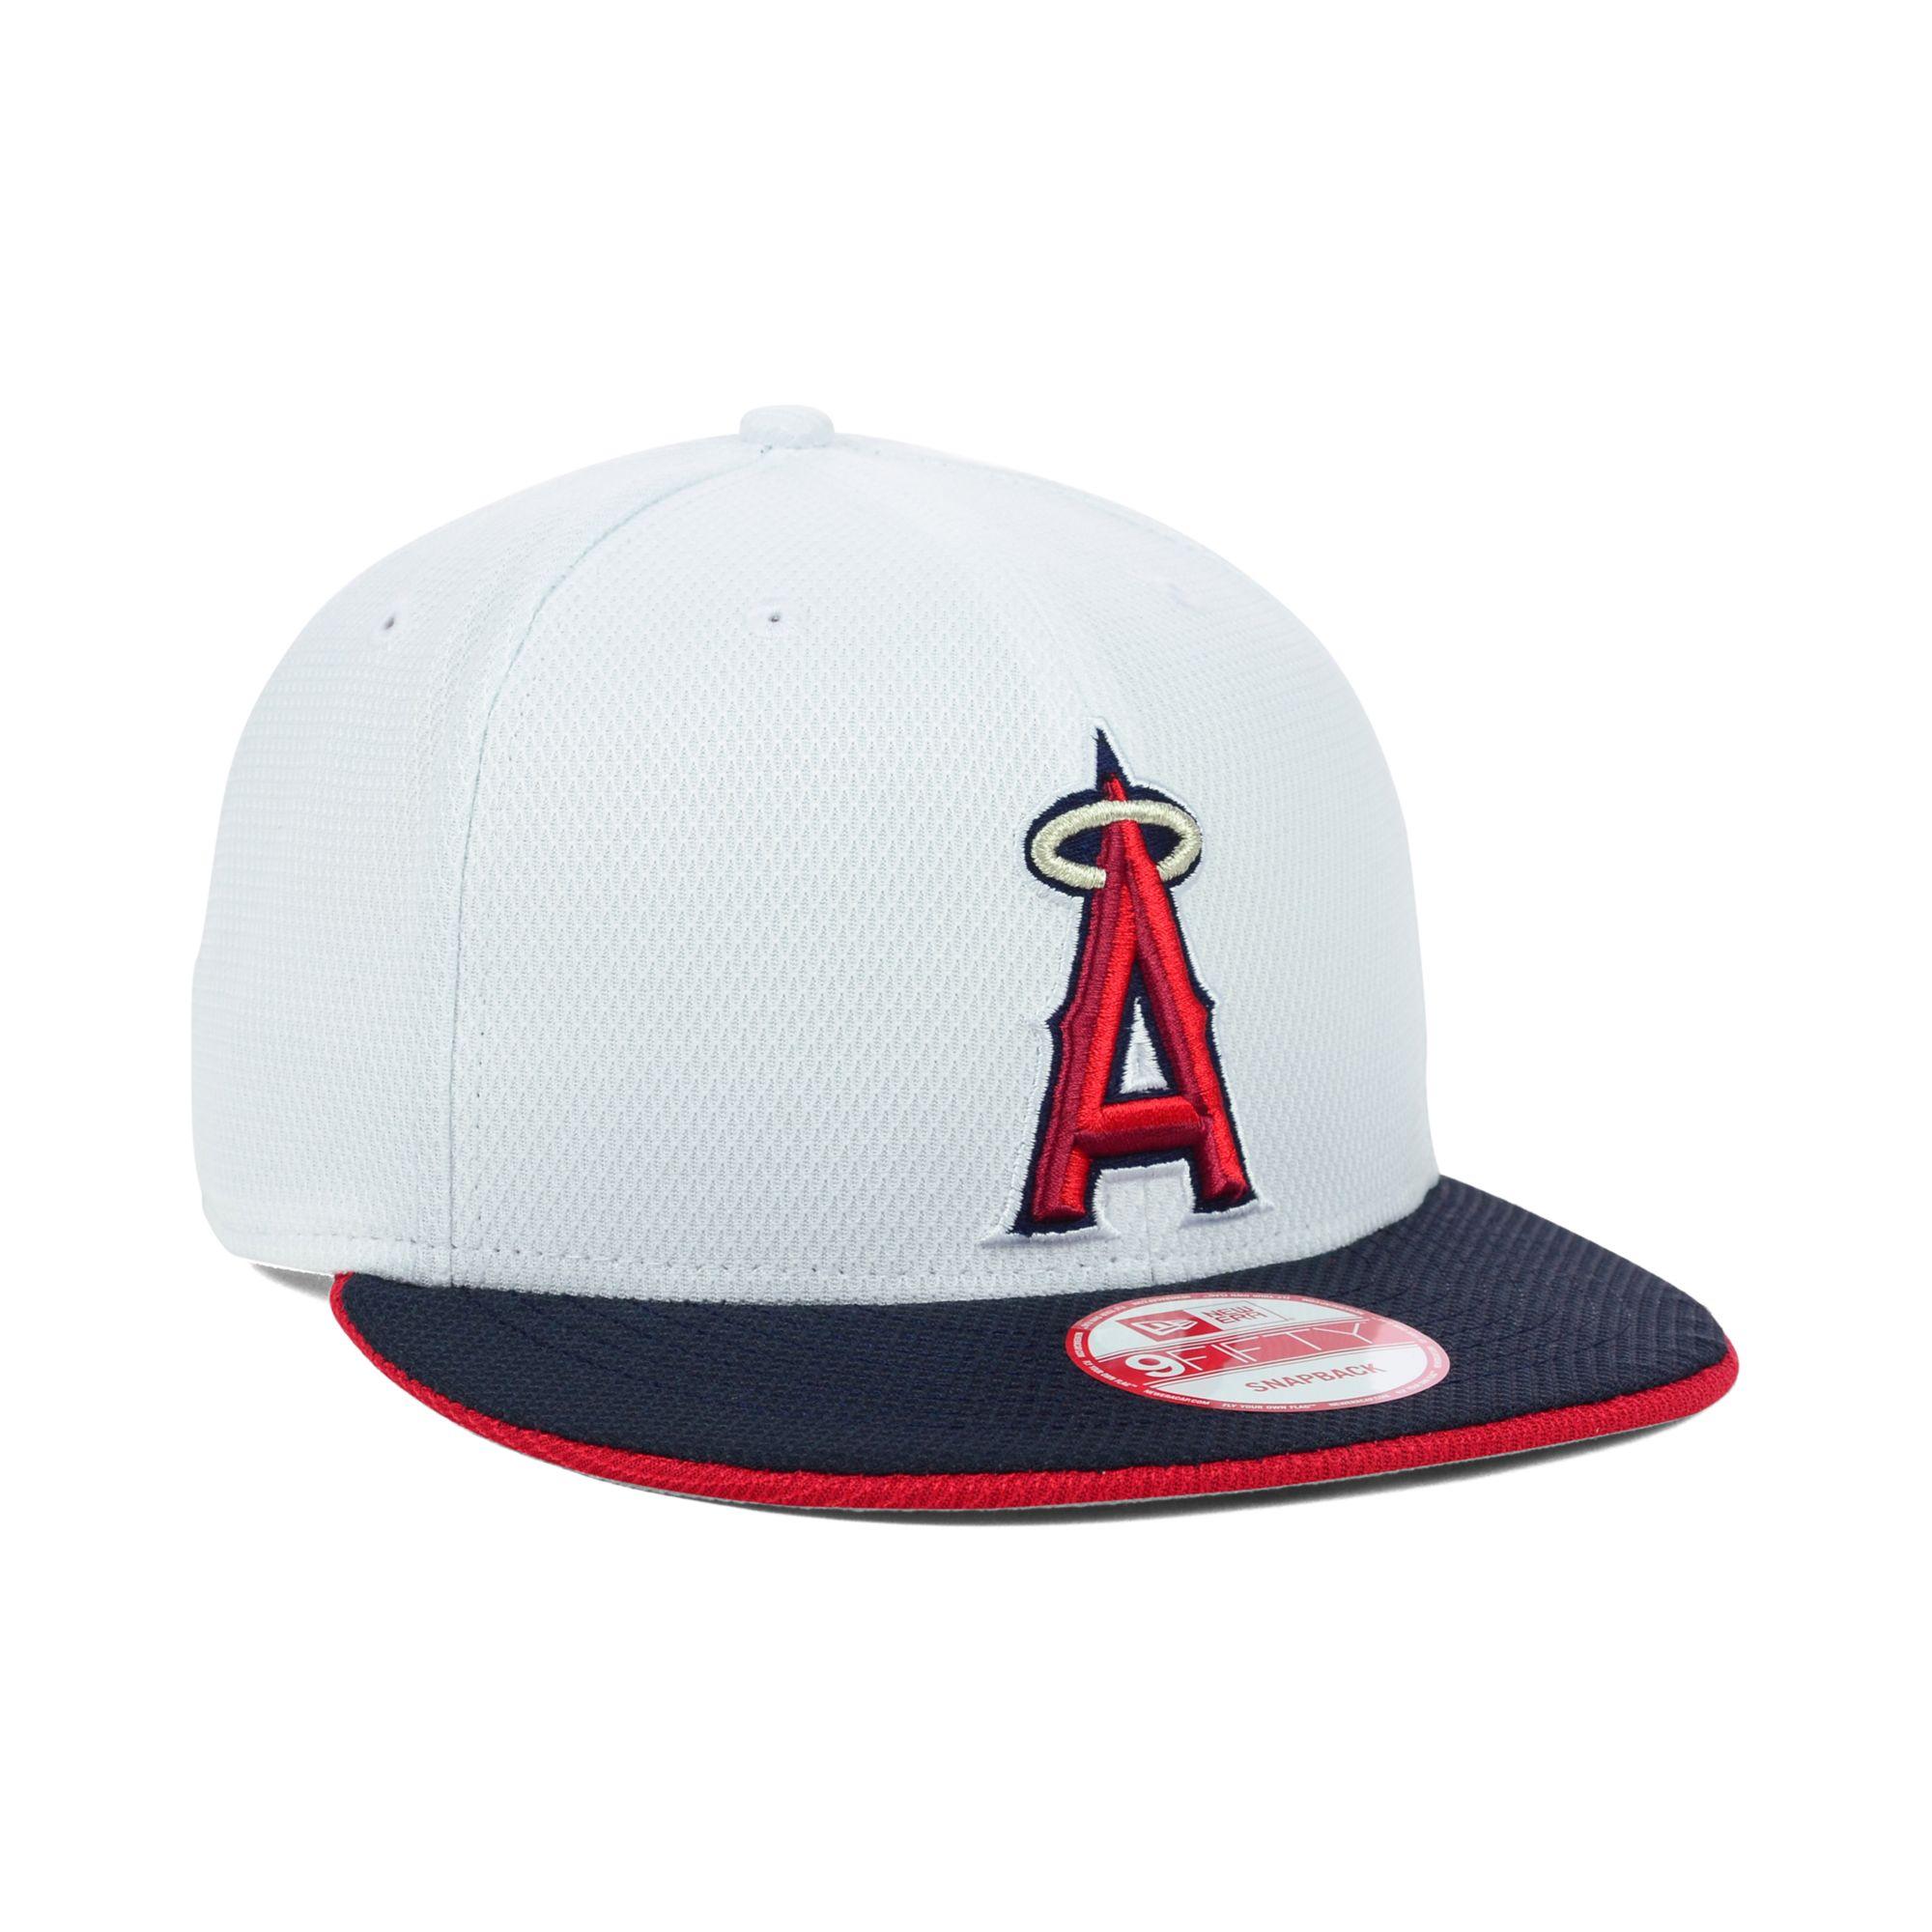 5a39c1db KTZ Los Angeles Angels Of Anaheim Mlb White Diamond Era 9fifty ...